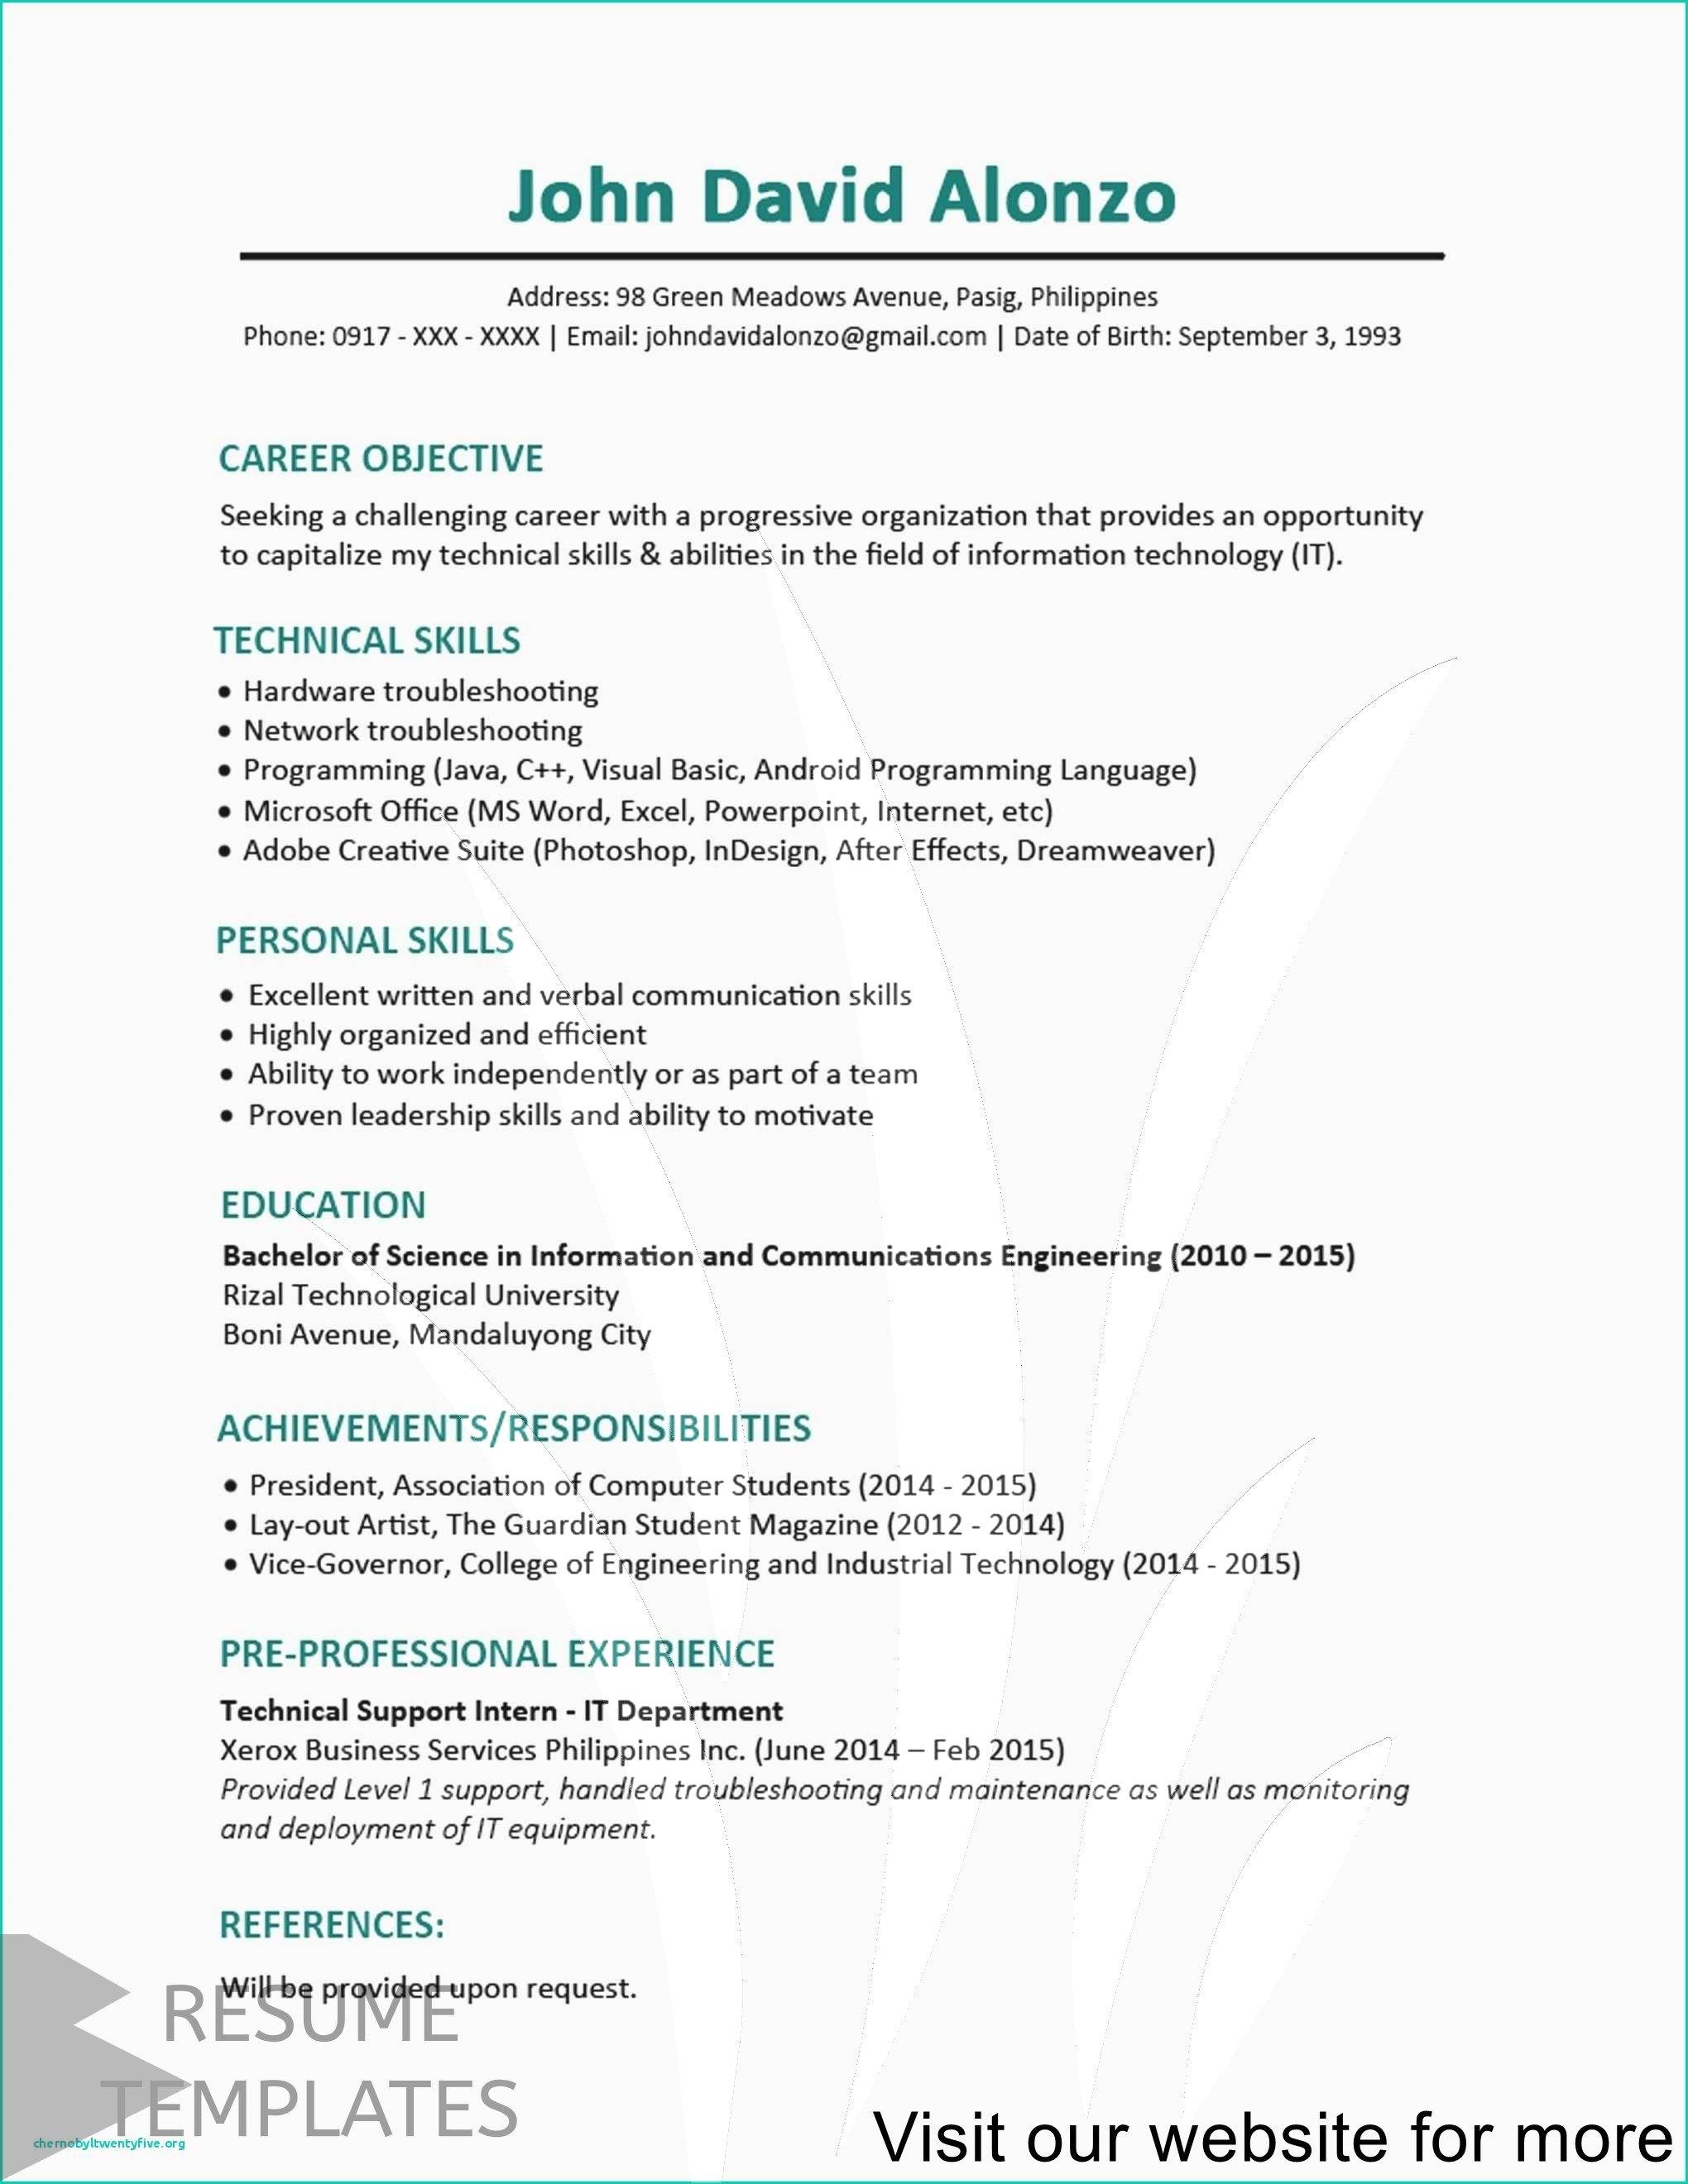 Resume Template Pdf Best Resume Template Professional Resume Template Resume Writing Tips